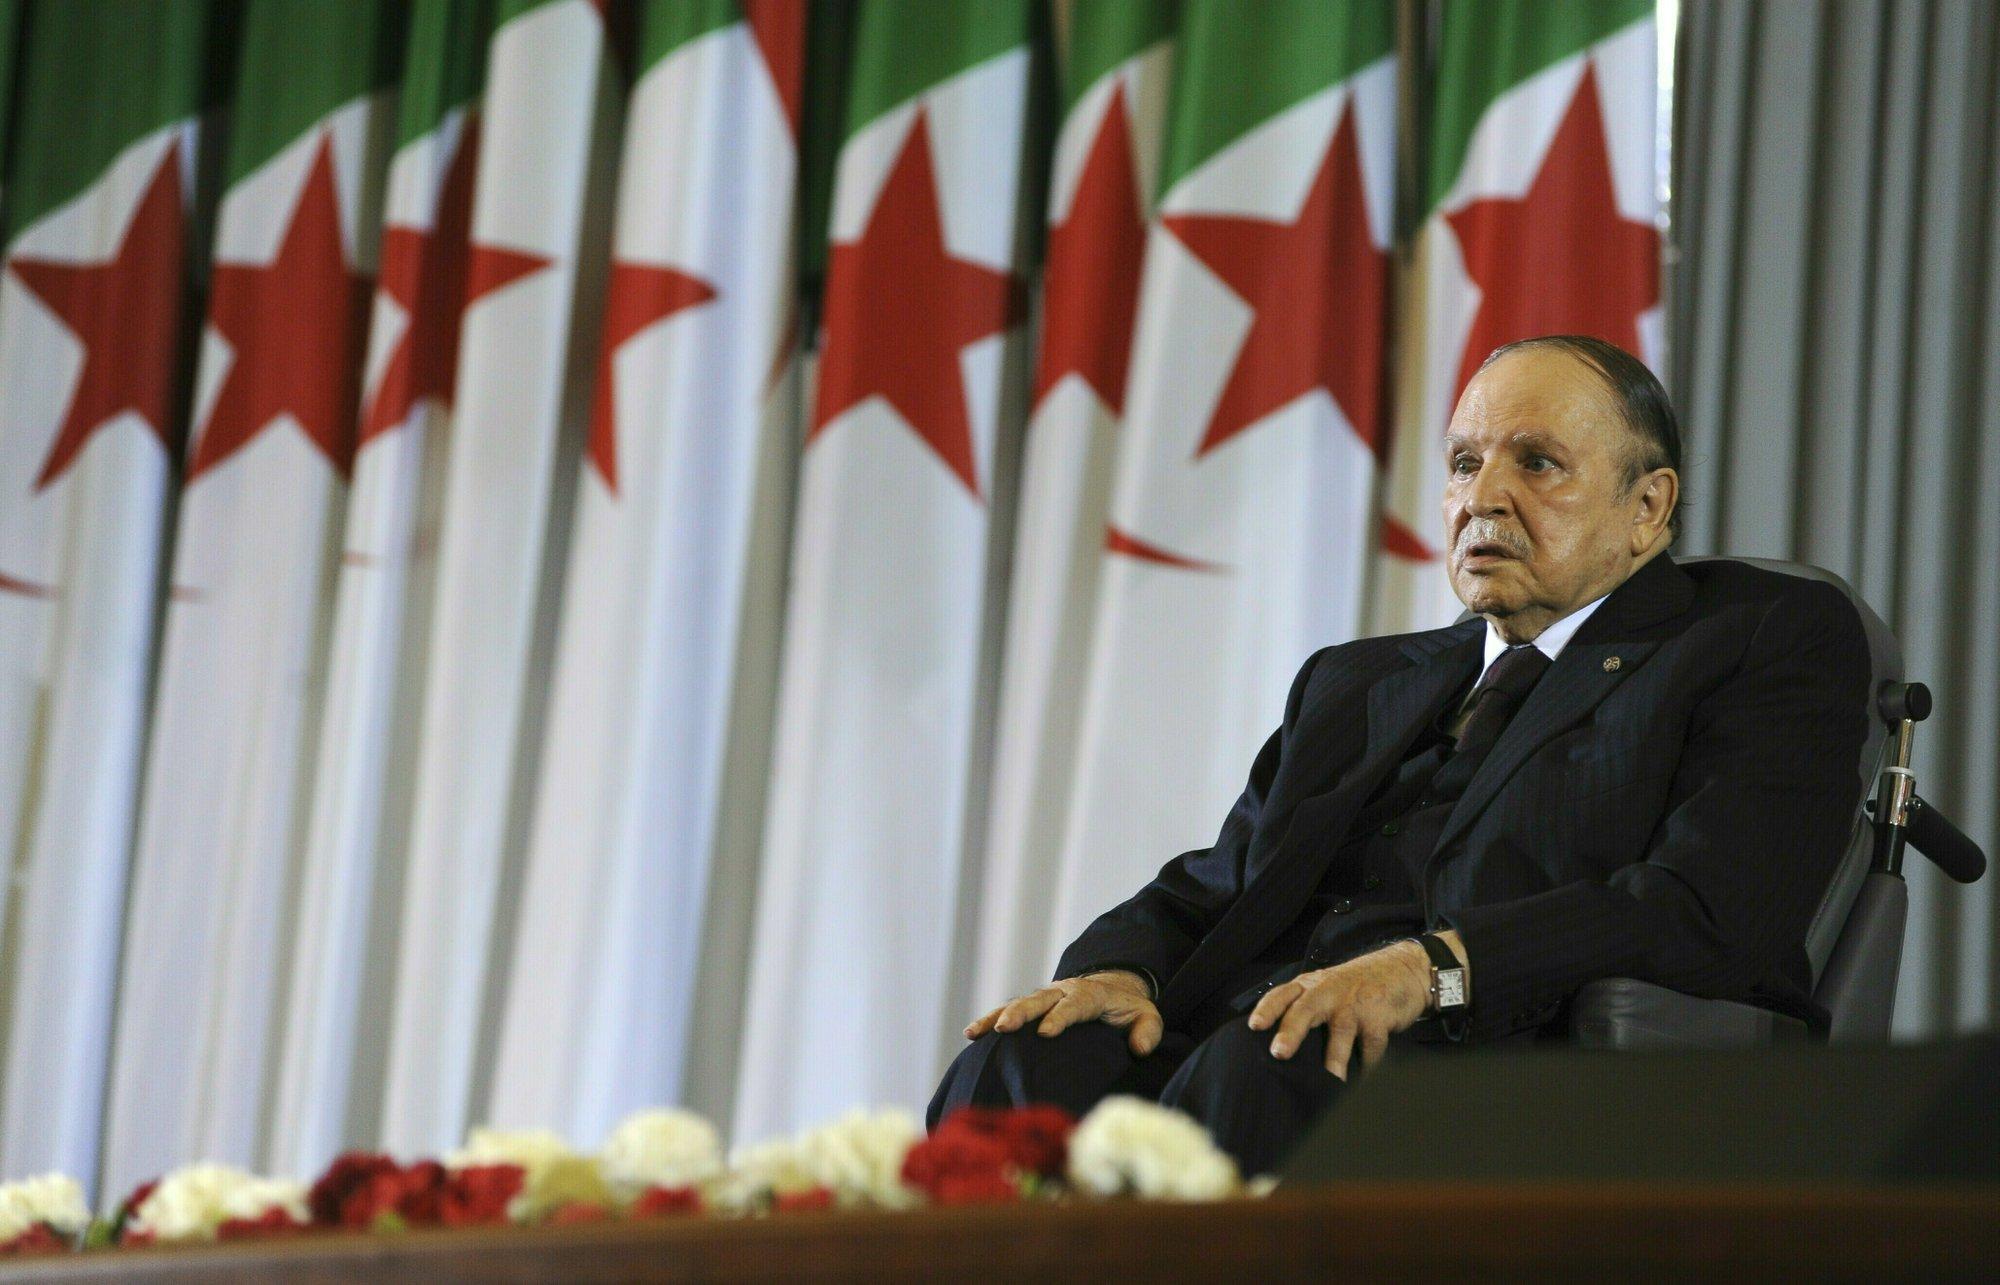 Partido gobernante en Argelia pide renuncia de presidente